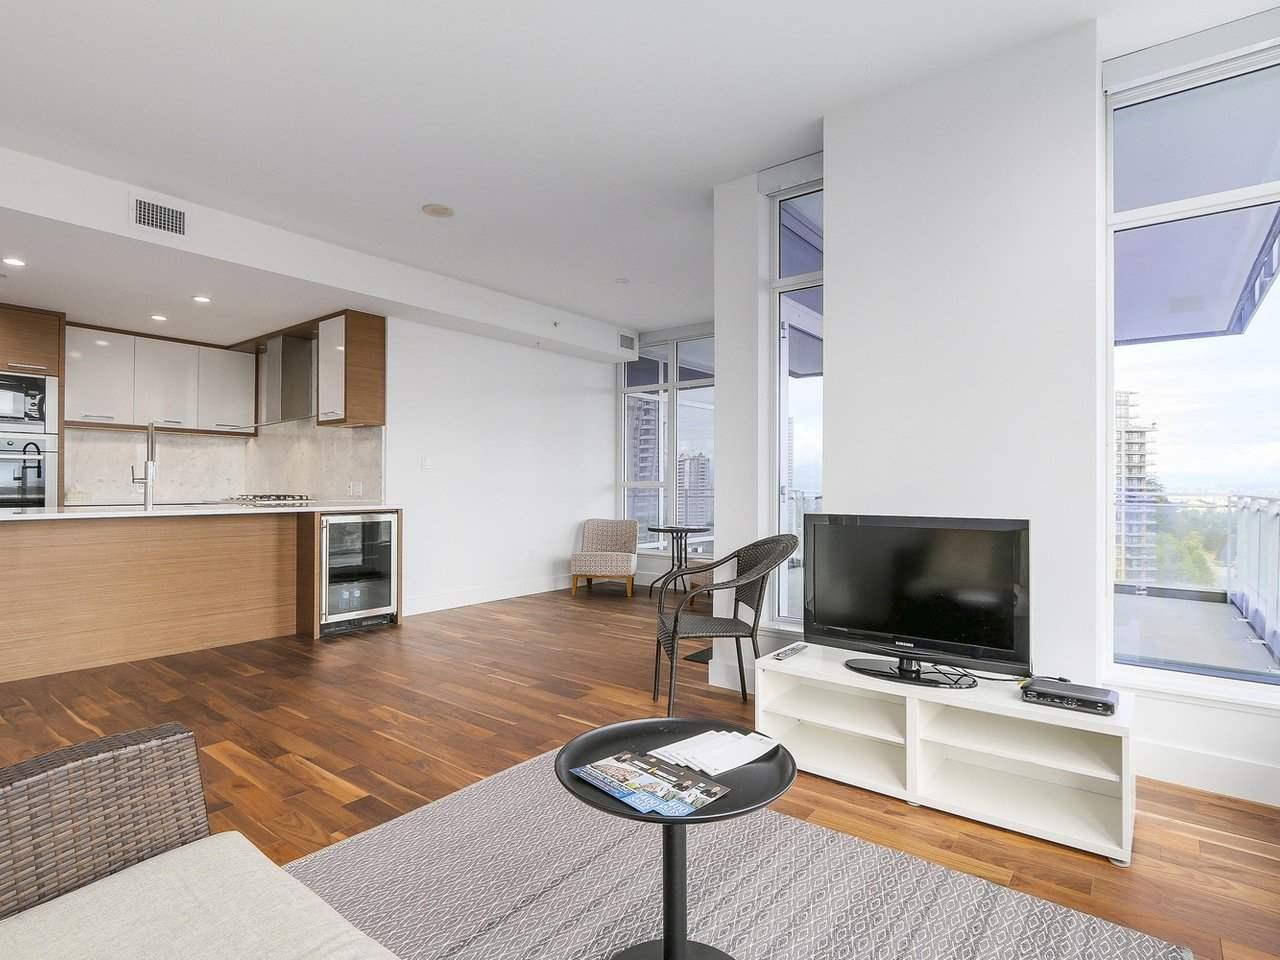 Condo Apartment at 1202 4360 BERESFORD STREET, Unit 1202, Burnaby South, British Columbia. Image 9